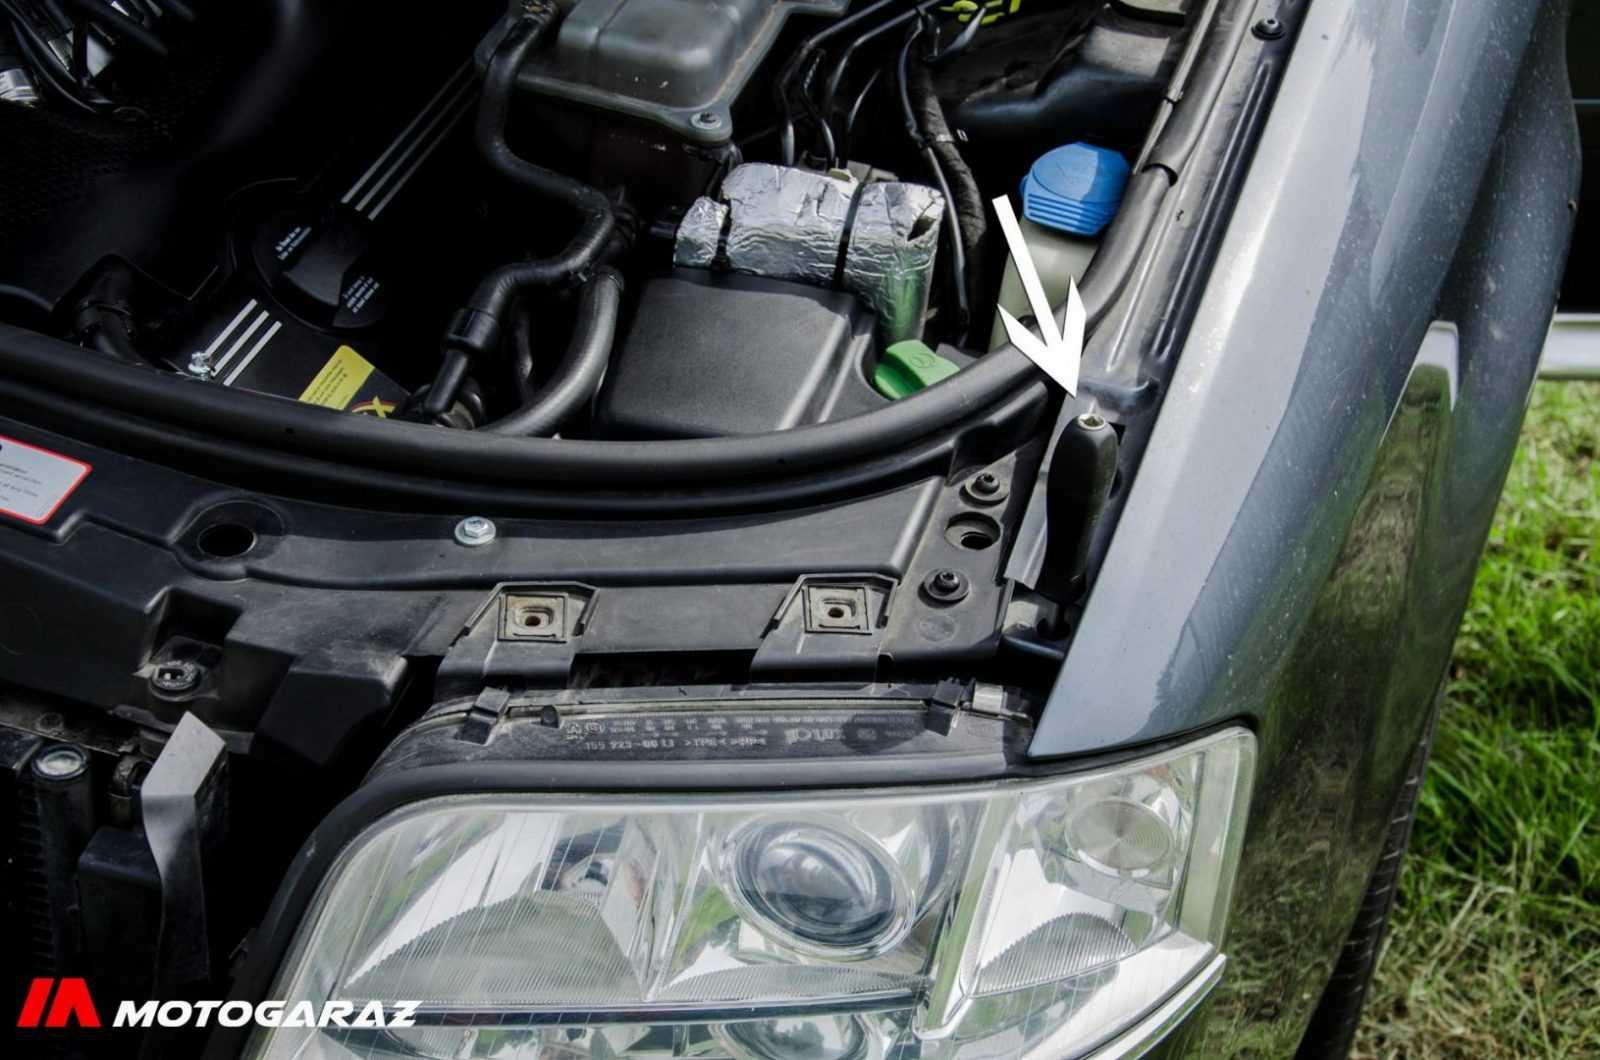 Wymiana lampy Audi a6c5 - fot. nr 5